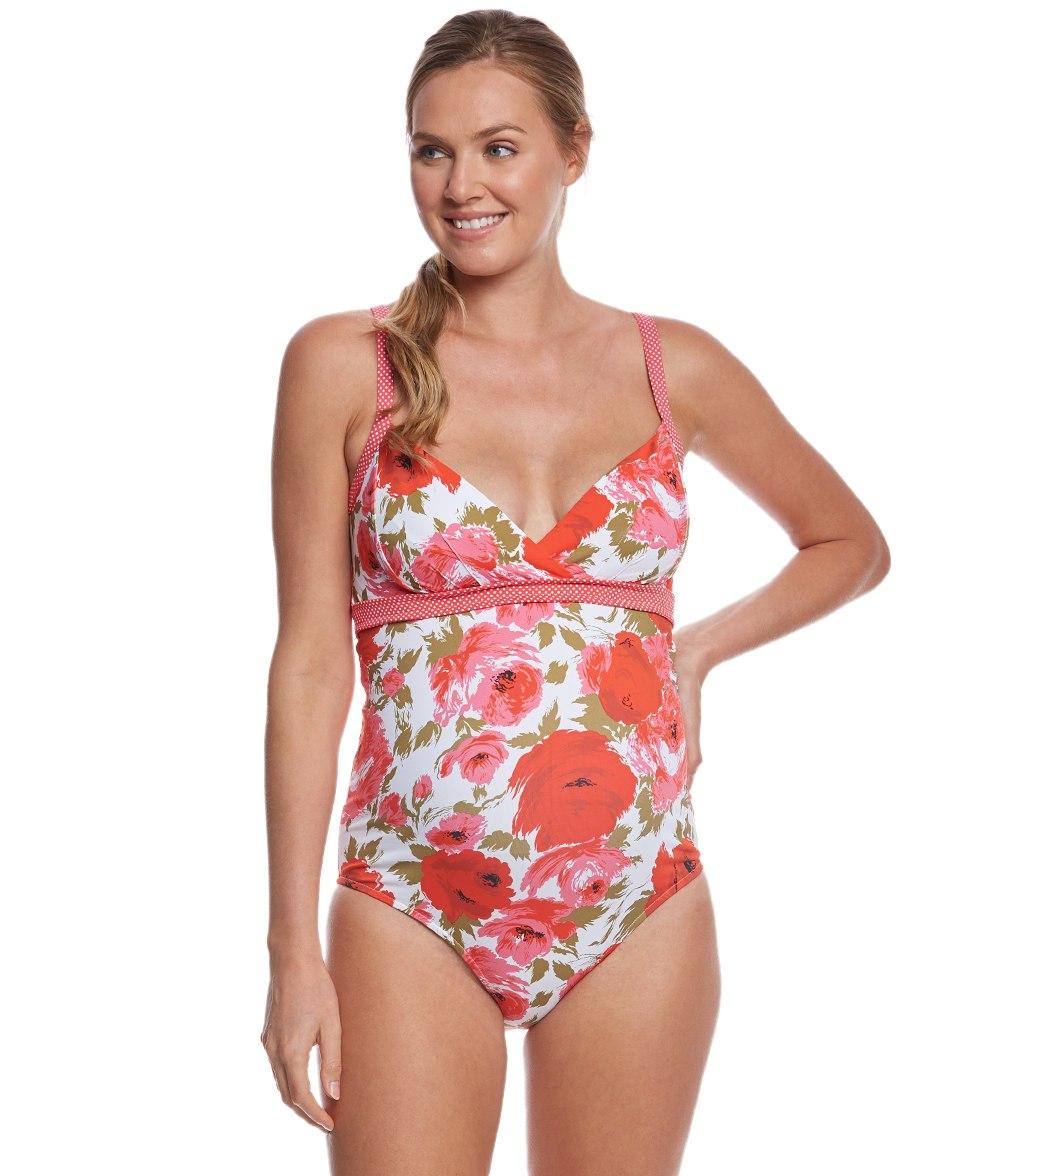 c5bea79968 ... Pez D'or Maternity Montego Bay Floral One Piece Swimsuit. Play Video.  MODEL MEASUREMENTS